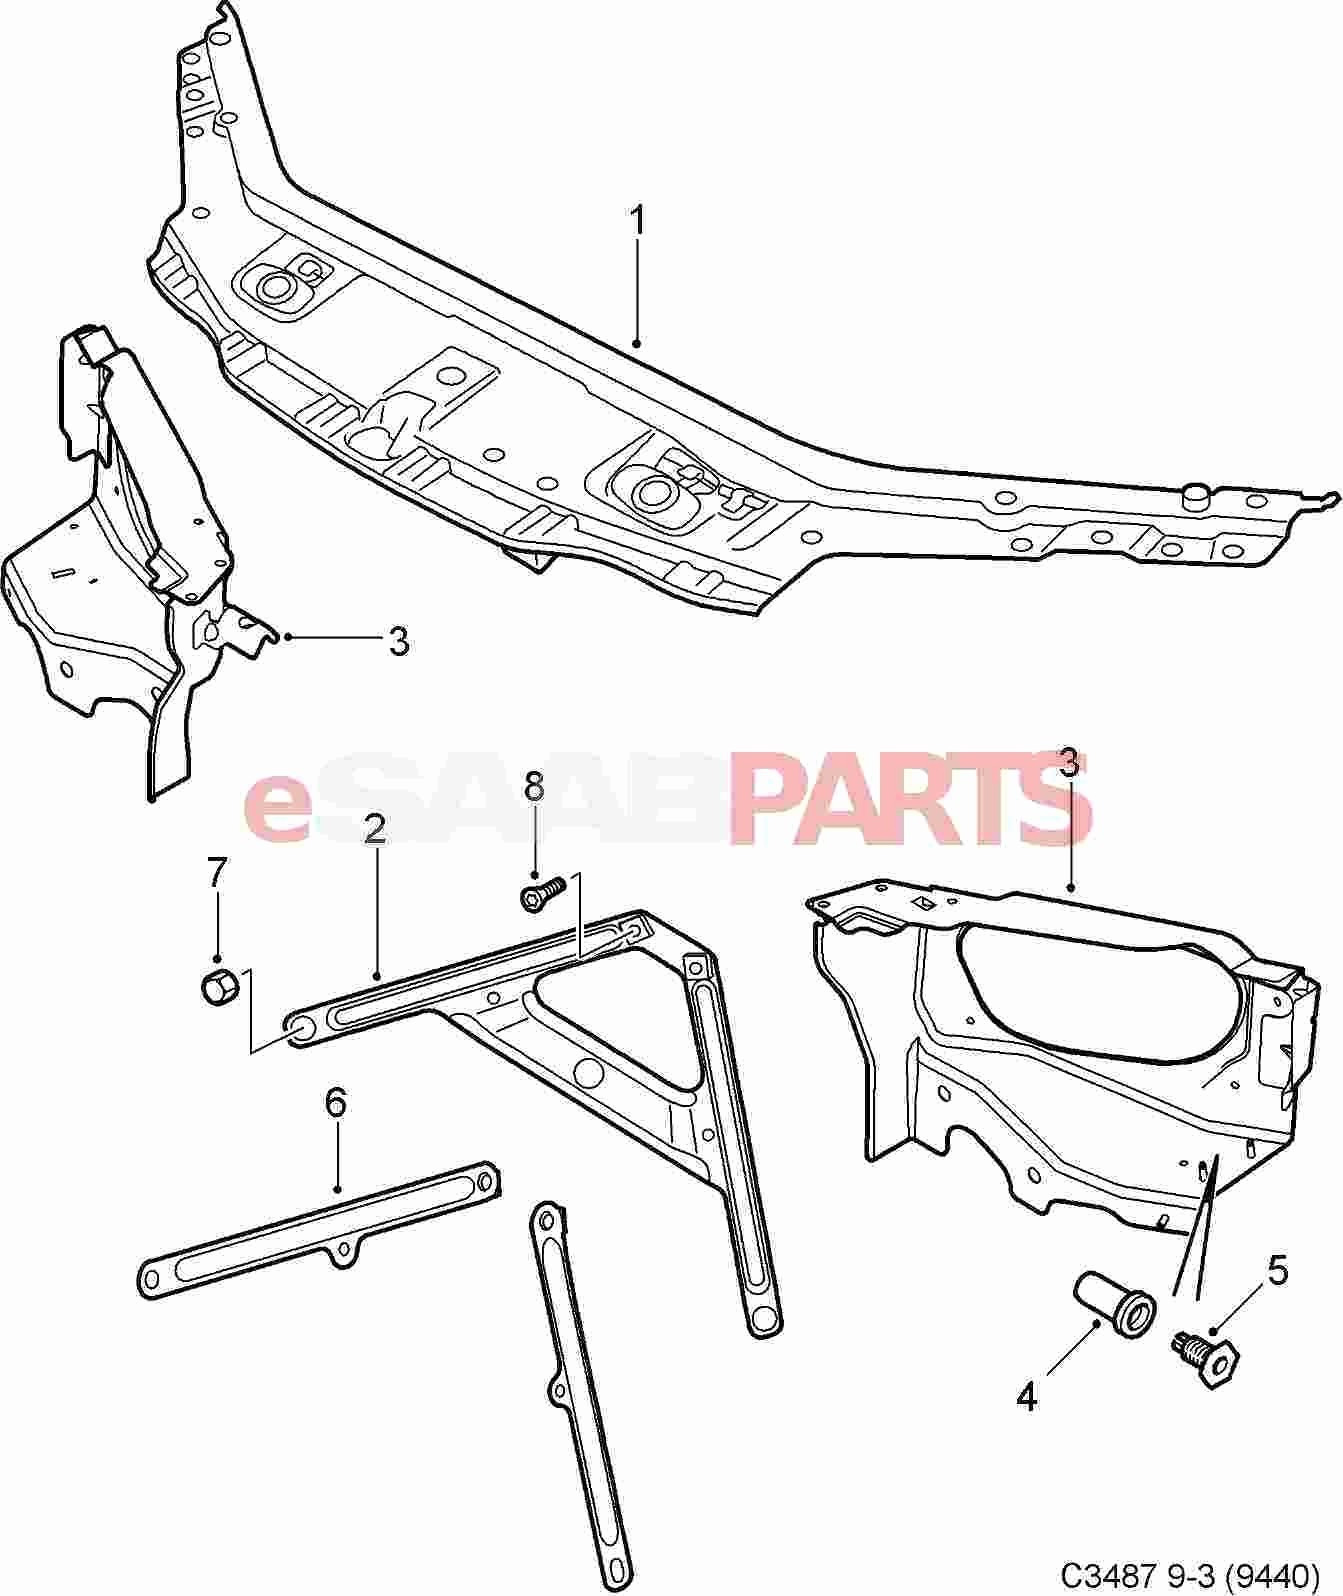 Car Undercarriage Parts Diagram Exterior Car Parts Diagram Car Exterior Body Parts Diagram Beautiful Of Car Undercarriage Parts Diagram